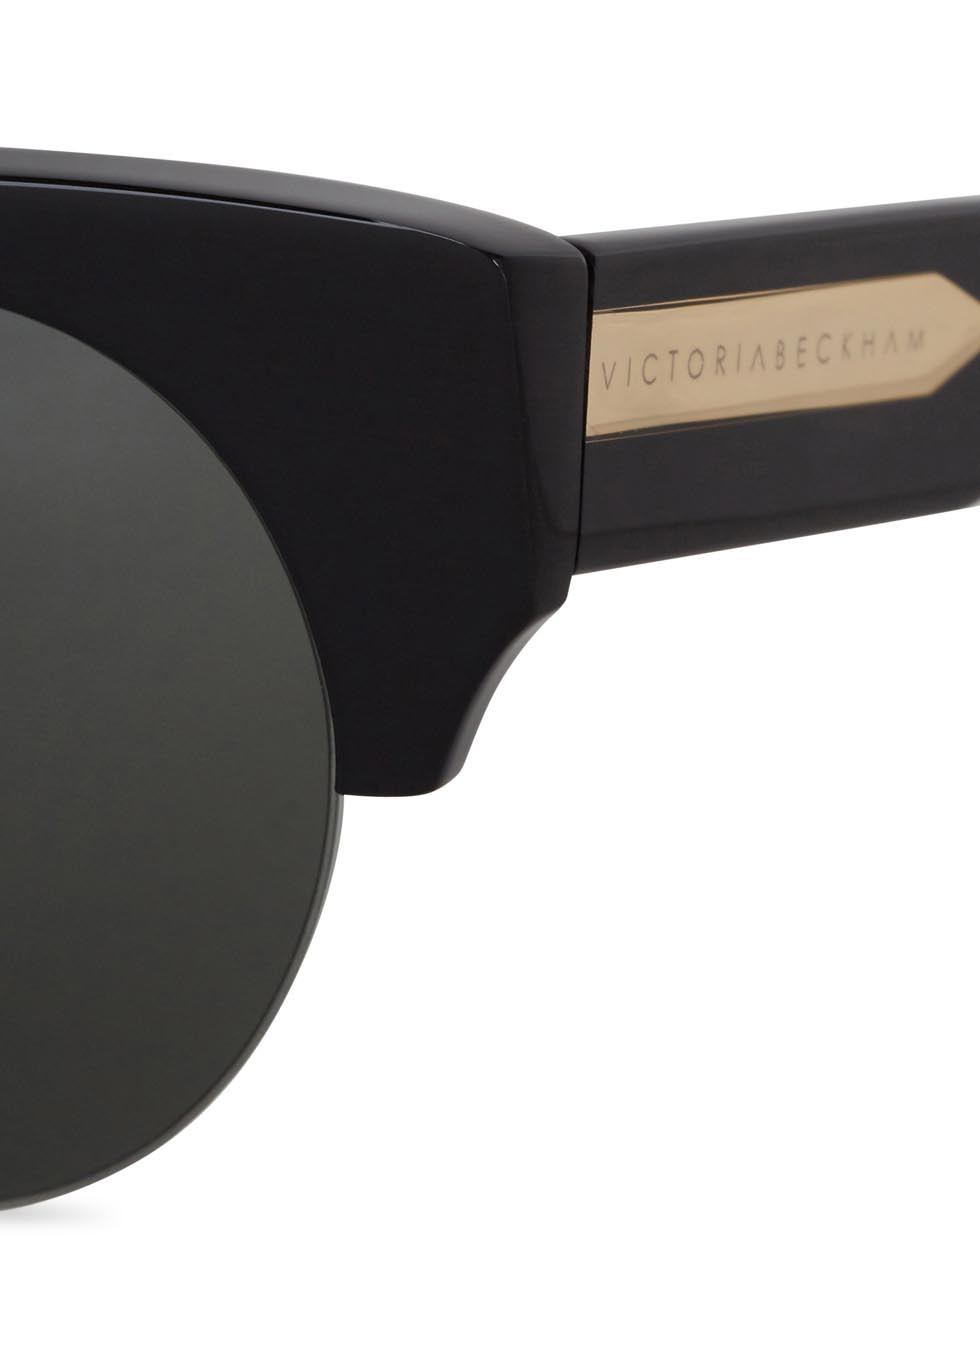 Supra Kitten black cat-eye sunglasses - Victoria, Victoria Beckham